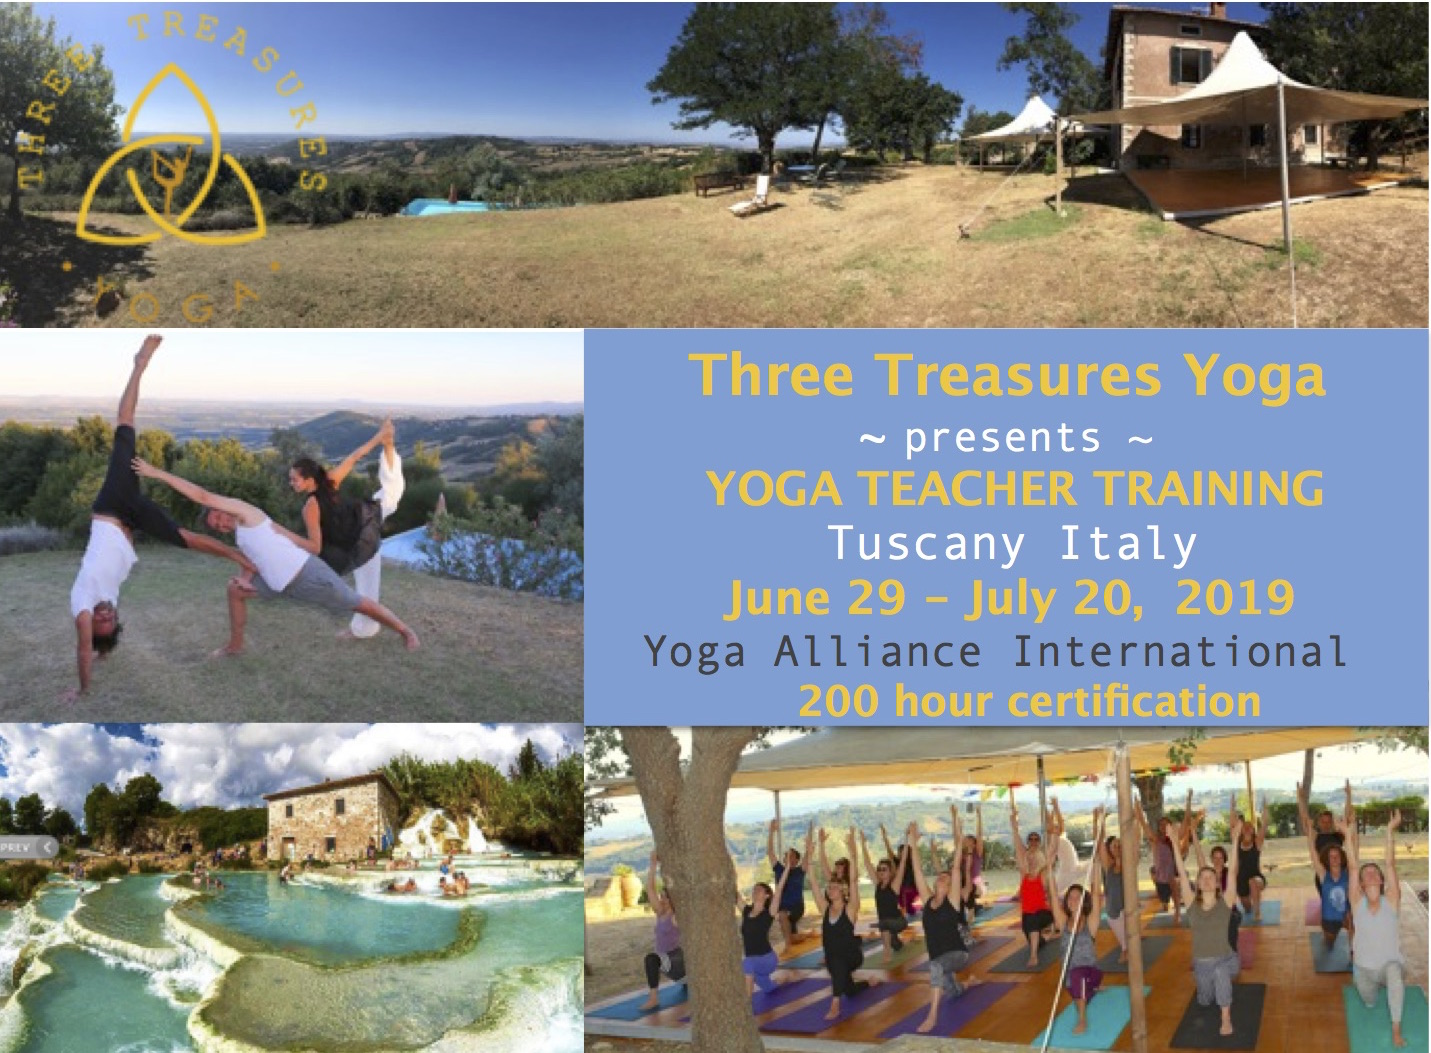 YOGA TEACHER TRAINING IN ITALY